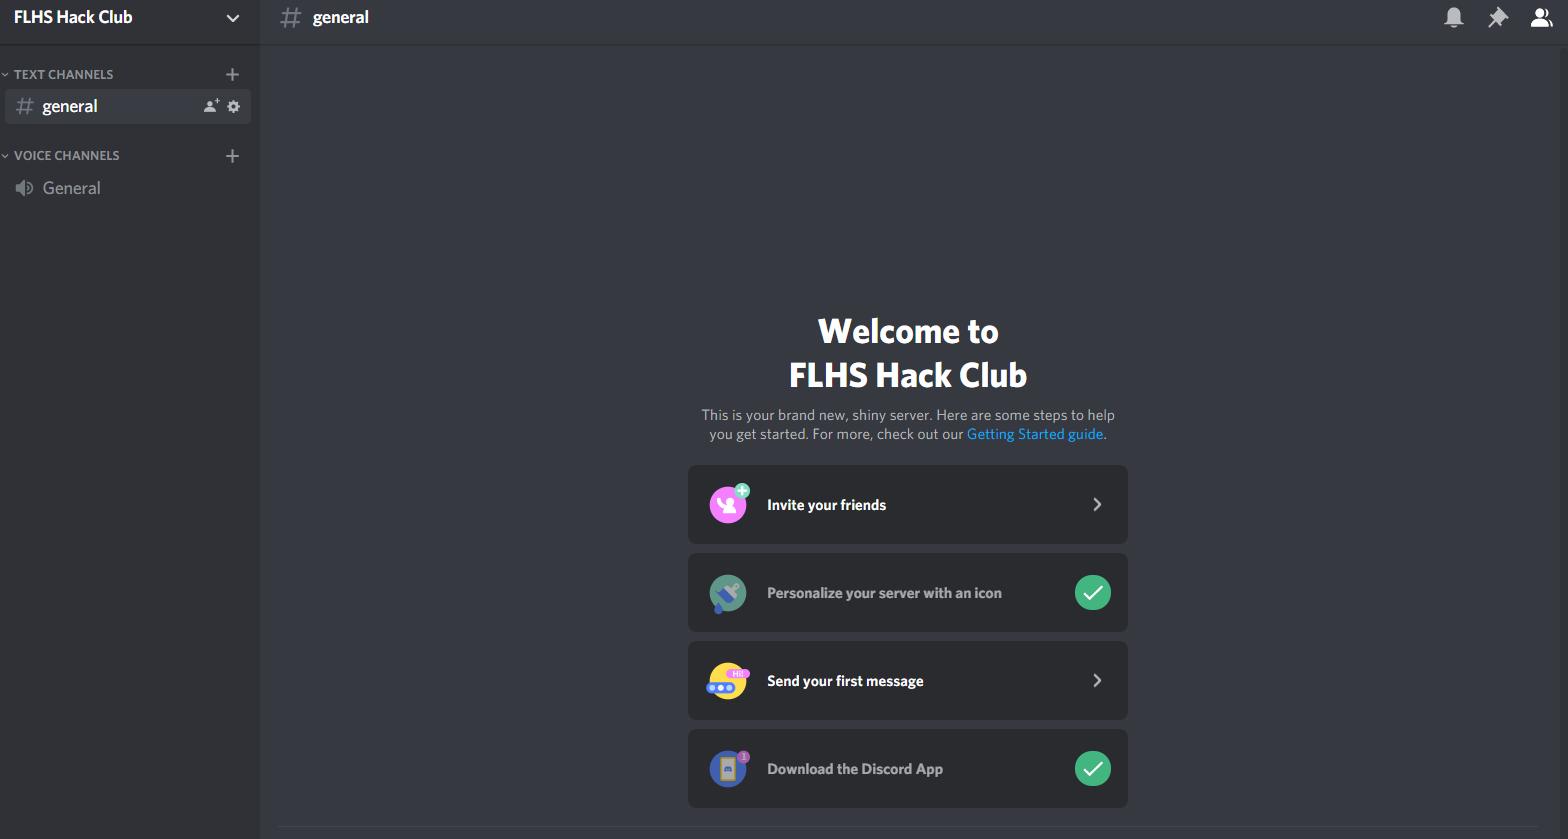 https://cloud-l8ynlvv83-hack-club-bot.vercel.app/0image.png